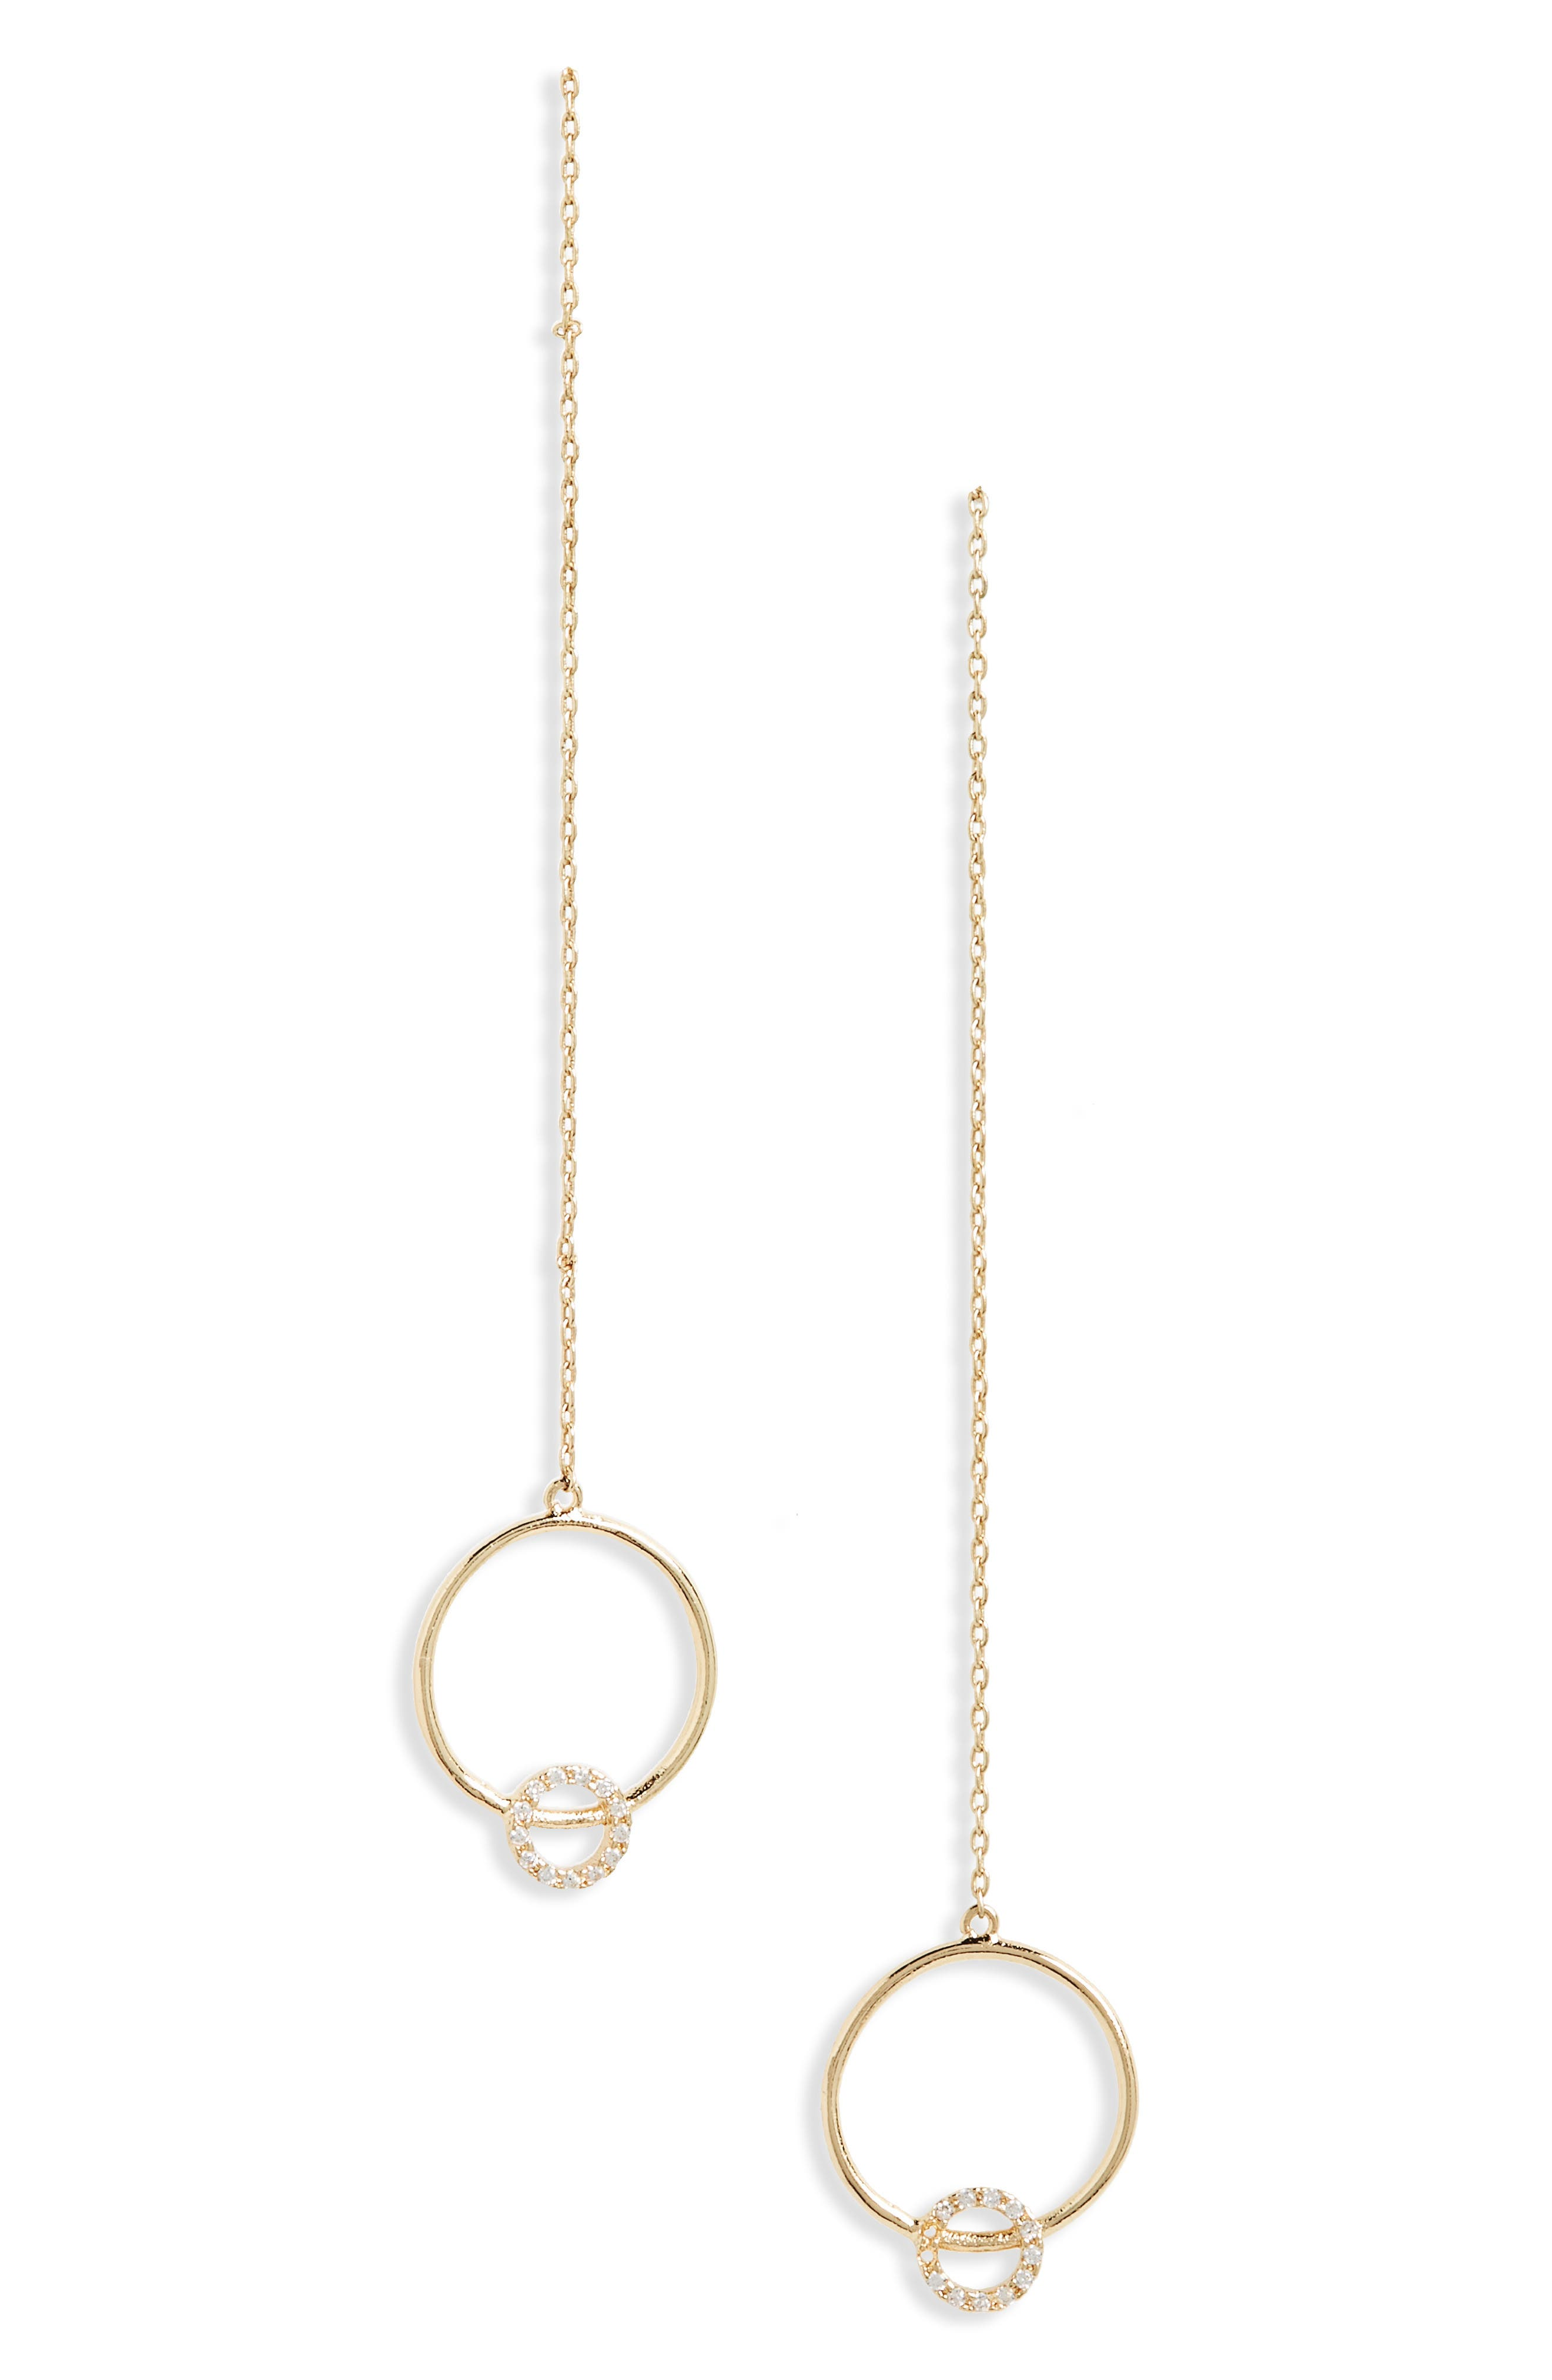 Crystal Circle Drop Earrings,                             Main thumbnail 1, color,                             710